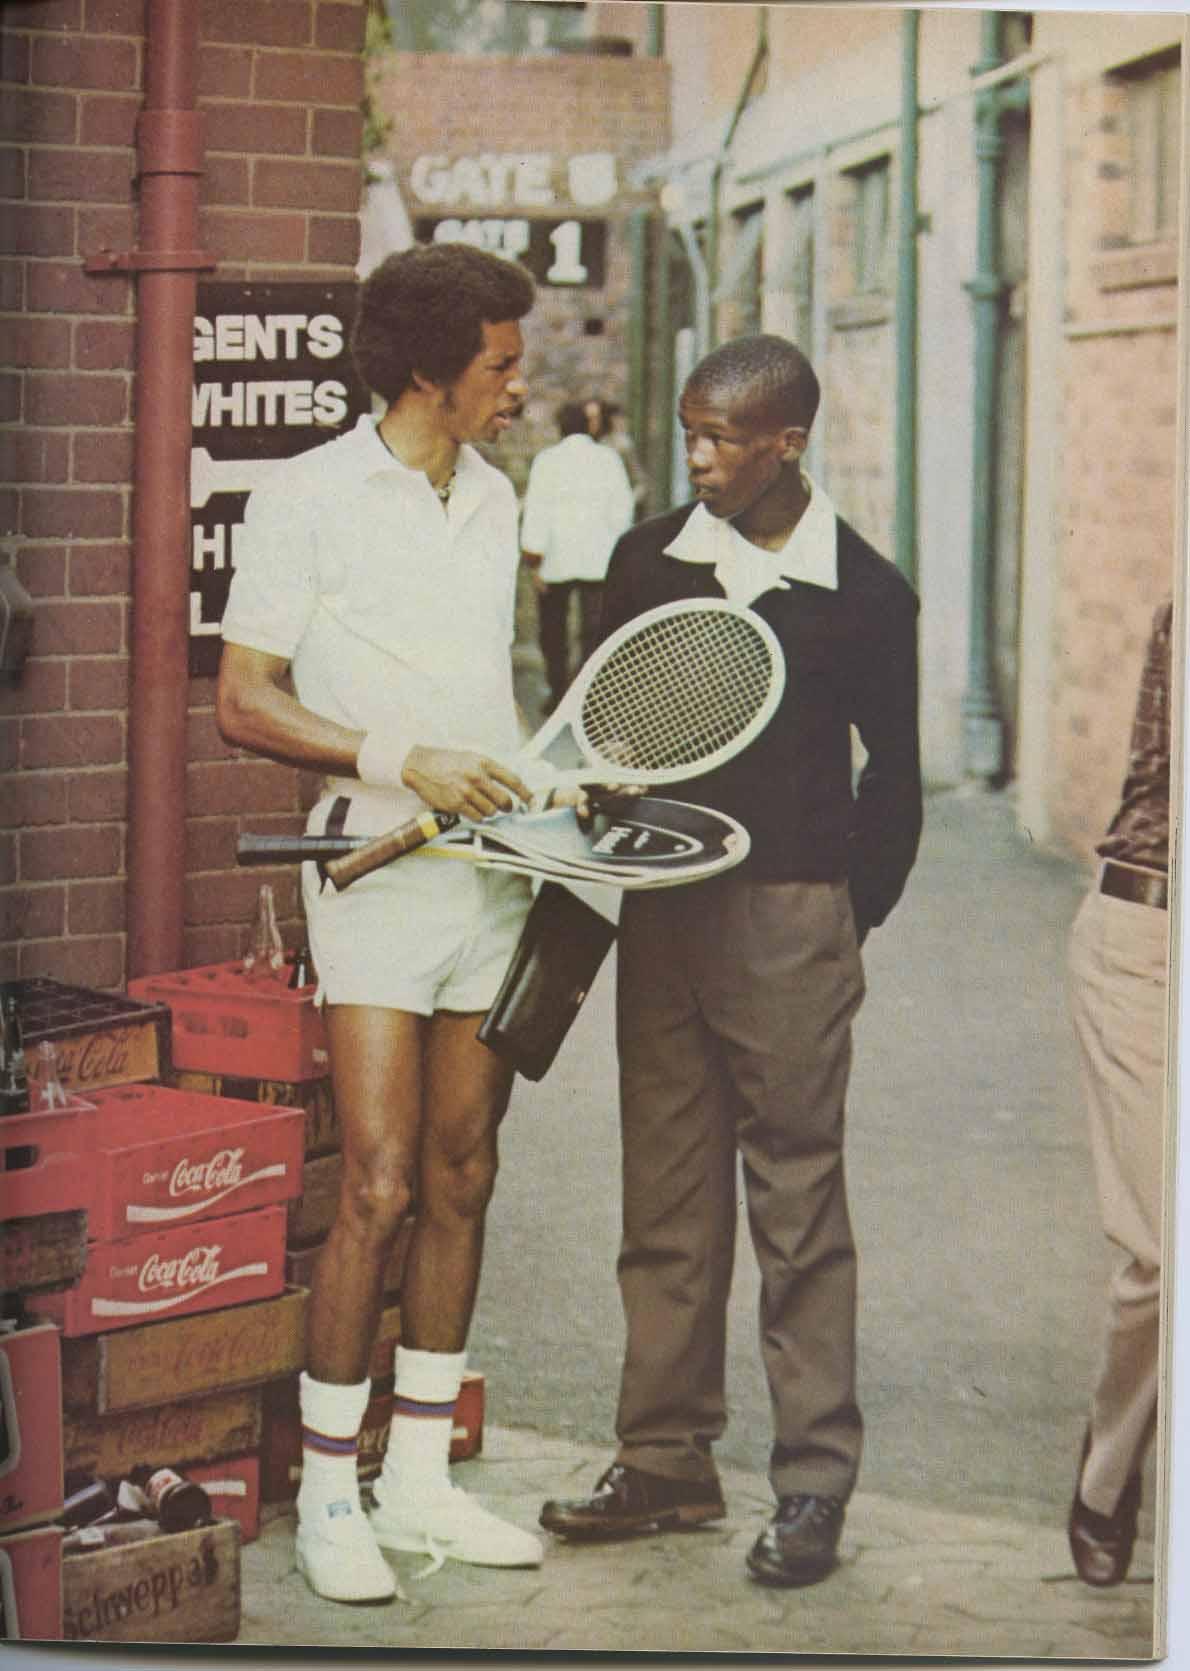 6173_P_JeanneAshe_With Arthur in South Africa World Tennis Magazine Feb 1974.jpg